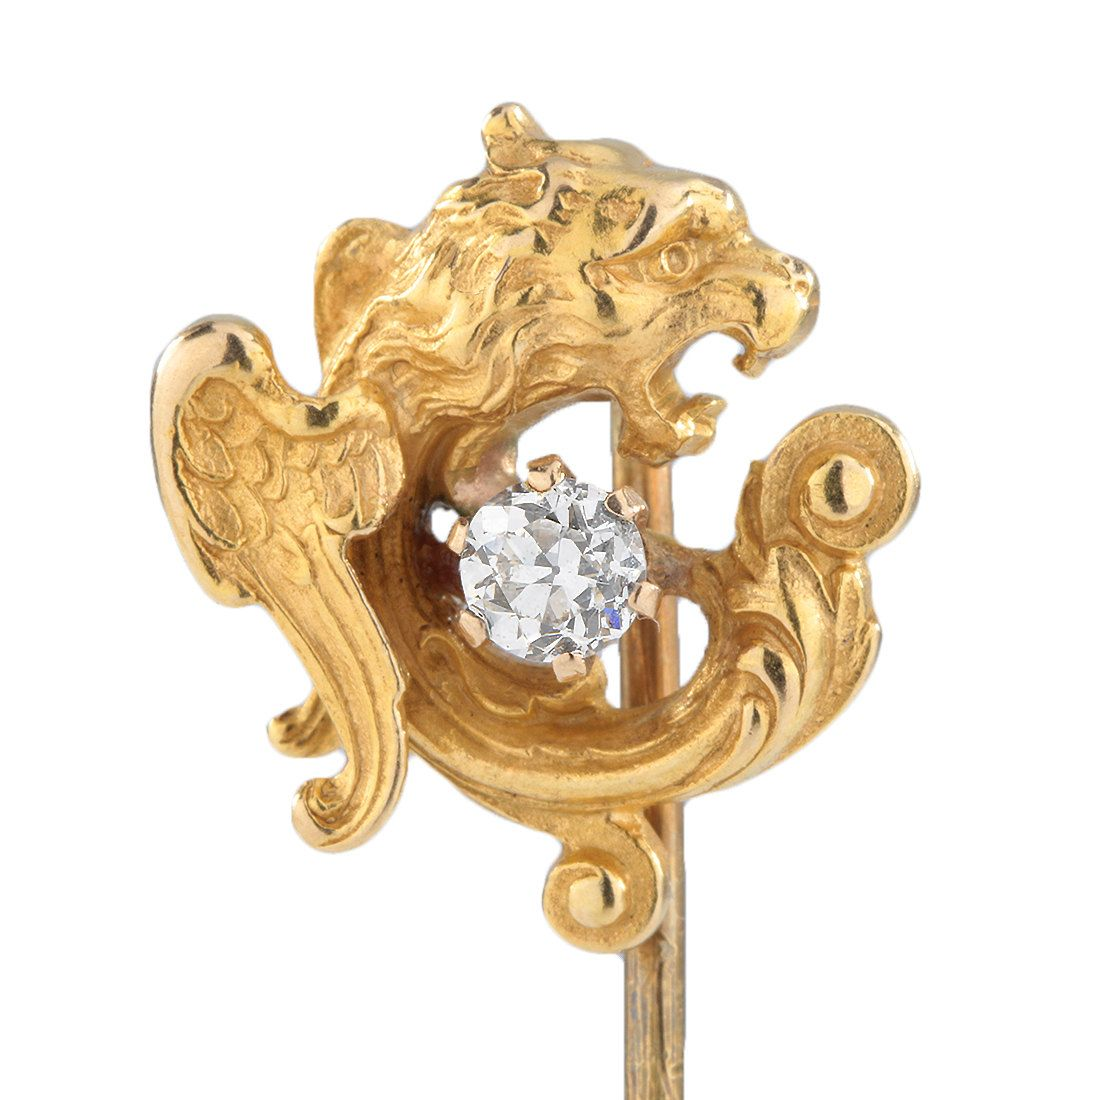 Stick pin stickpin Antique vintage Victorian diamond gold Basilisk   0ld European diamond   14 Karat   Gryphon Griffin   eagle   serpent by DavidJThomasJewelry on Etsy